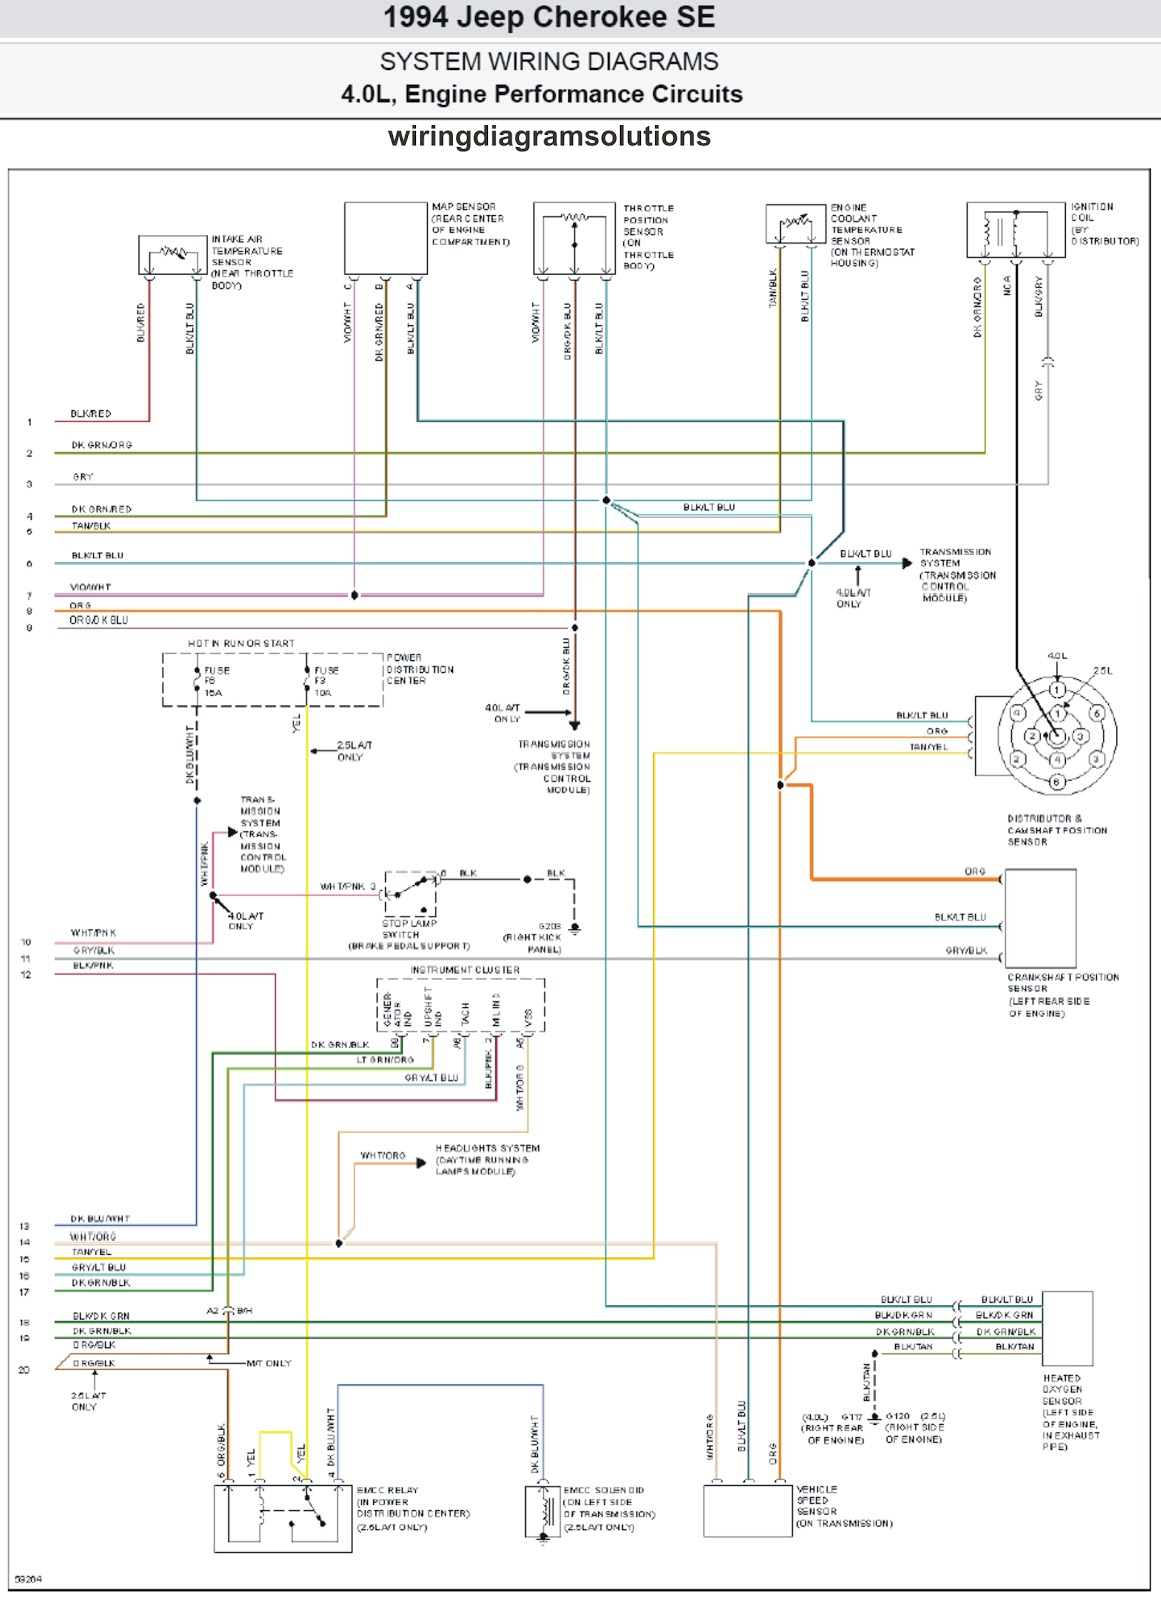 1999 Jeep Cherokee Wiring Diagram   Wiring Diagram Jeep Xj Wiring Harness Diagram on jeep 4 0 wiring harness, jeep grand wagoneer wiring harness, jeep wj wiring harness, chrysler wiring harness, jeep cherokee starter wire harness, jeep wiring diagram, jeep jk wiring harness, suzuki wiring harness, jeep door wiring harness, tundra wiring harness, jeep grand cherokee trailer wiring, cherokee wiring harness, jeep willys wiring harness, jeep wiring harness kit, jeep commander wiring harness, zj wiring harness, d16y8 wiring harness, jeep xj horn wiring, jeep cj wiring harness,